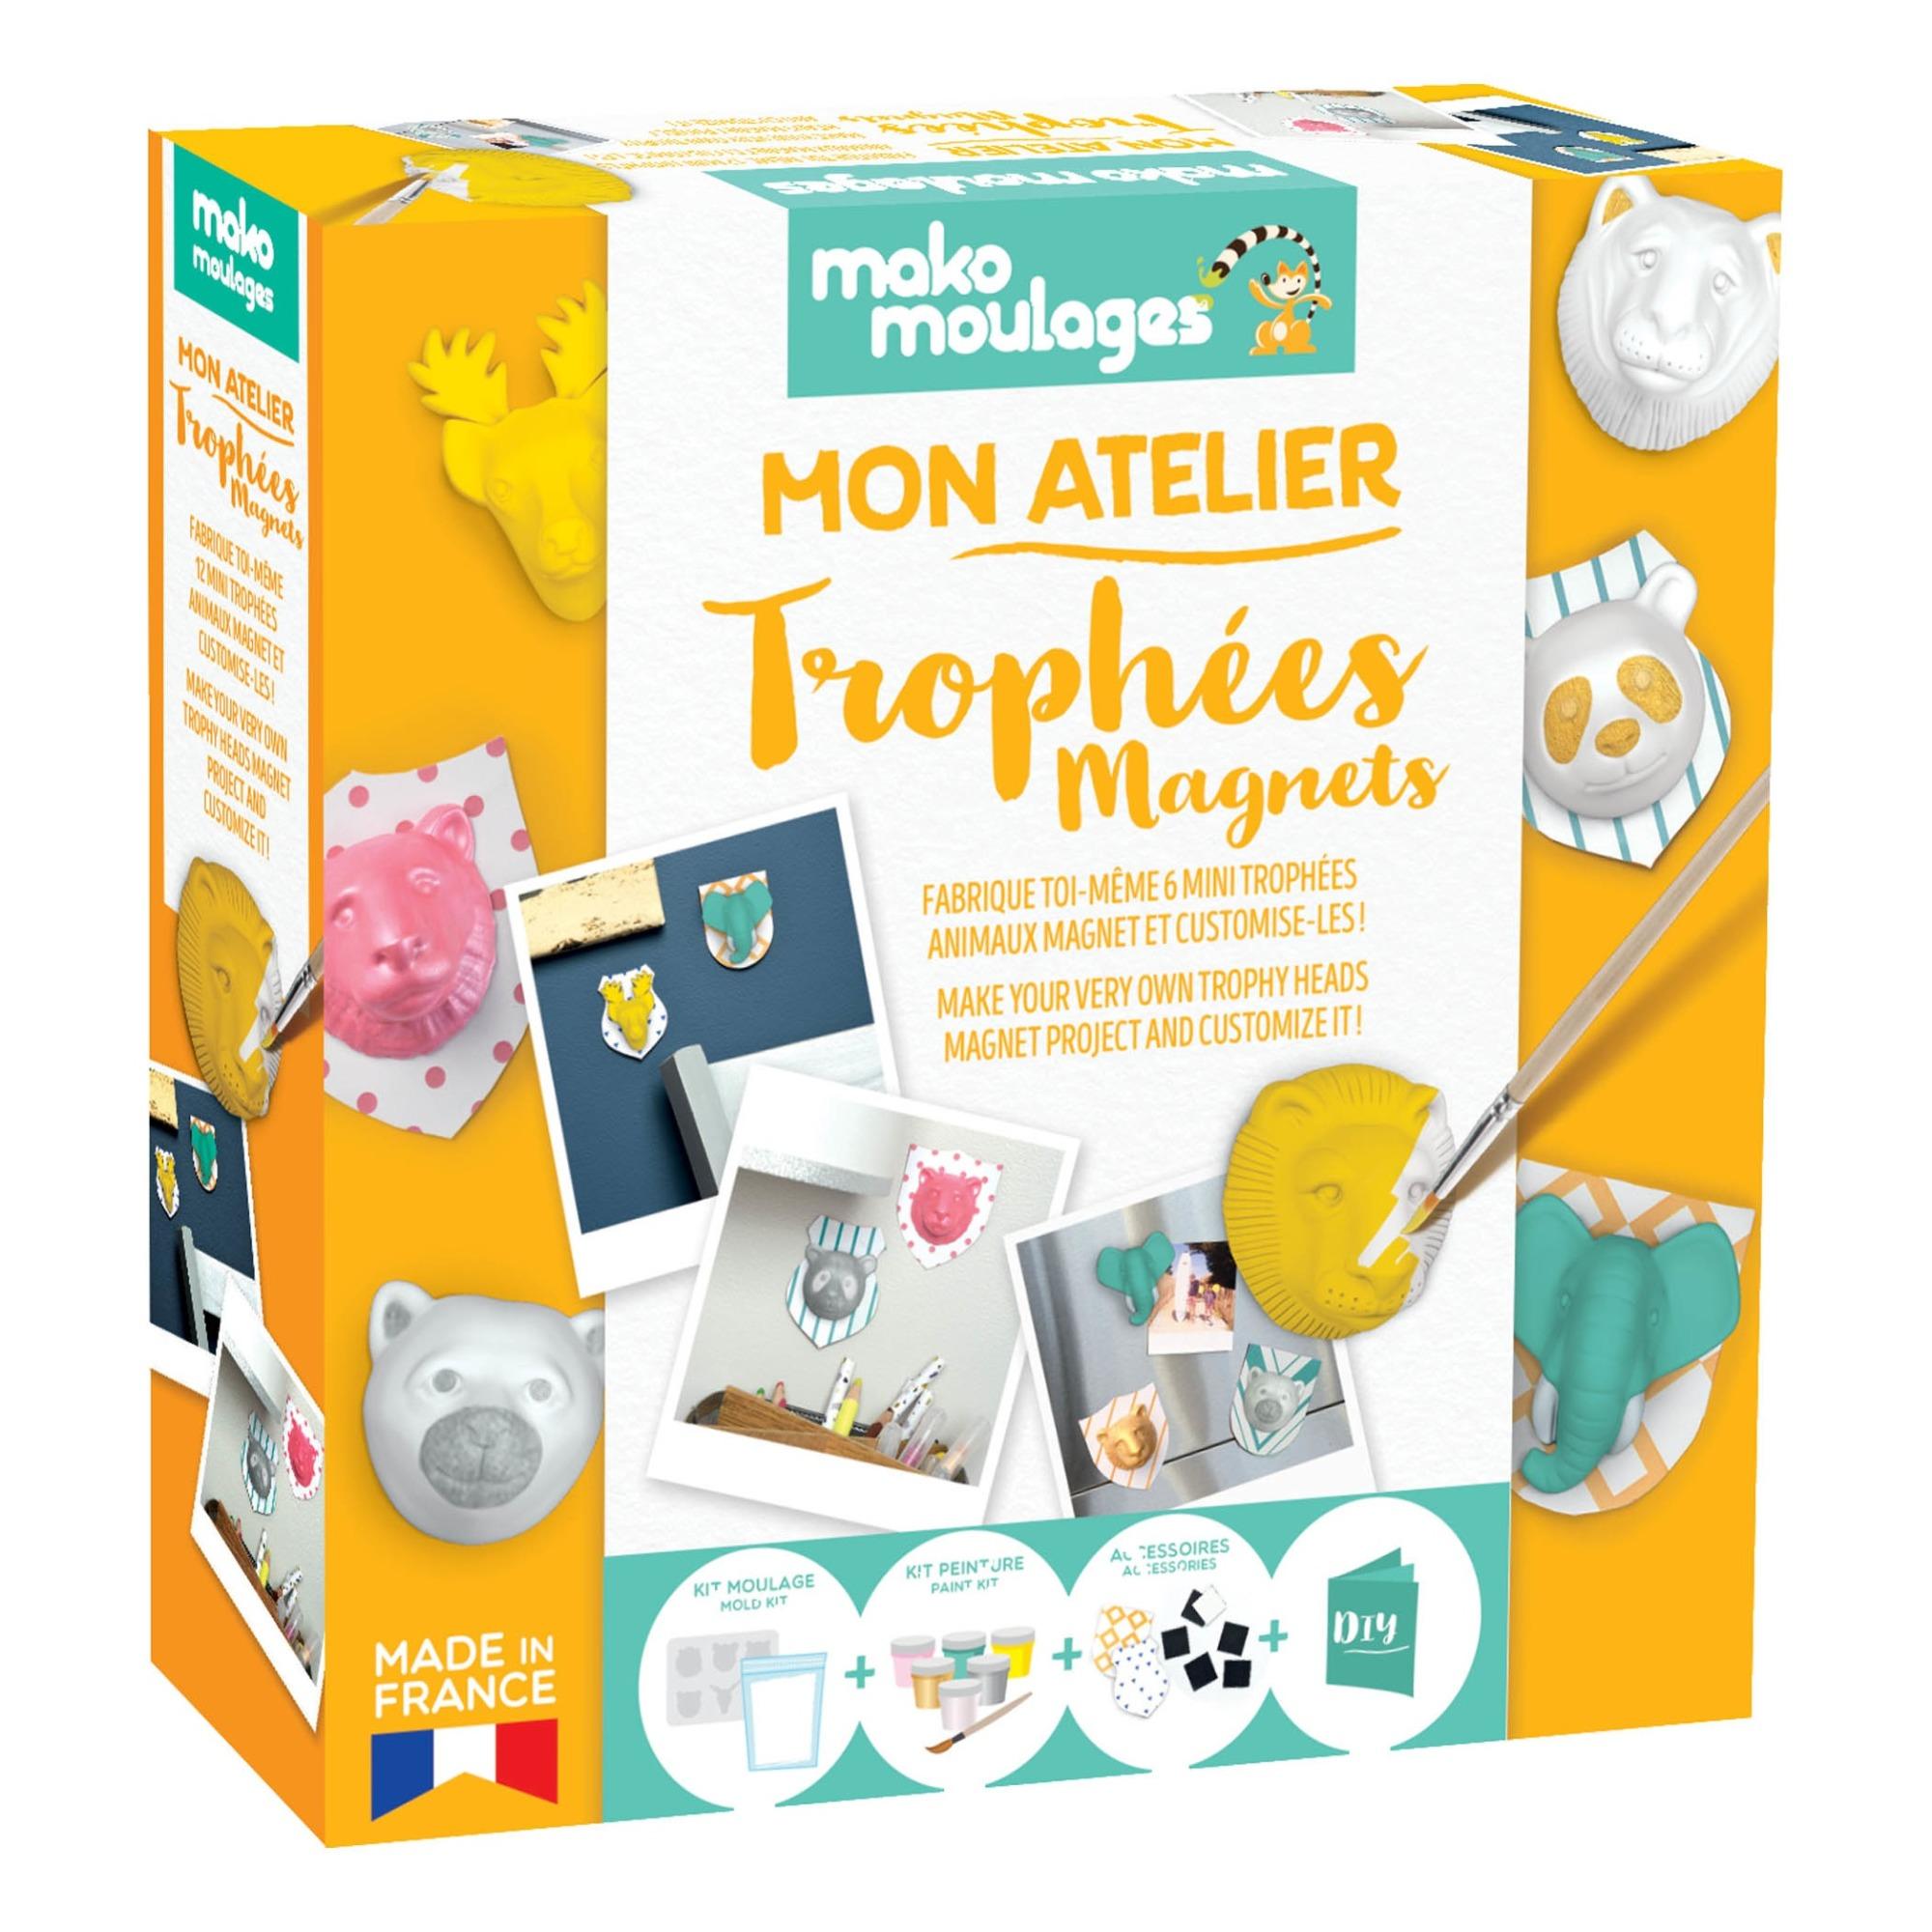 coffret-diy-mon-atelier-trophees_copie_5dfb61ade0f24.jpg